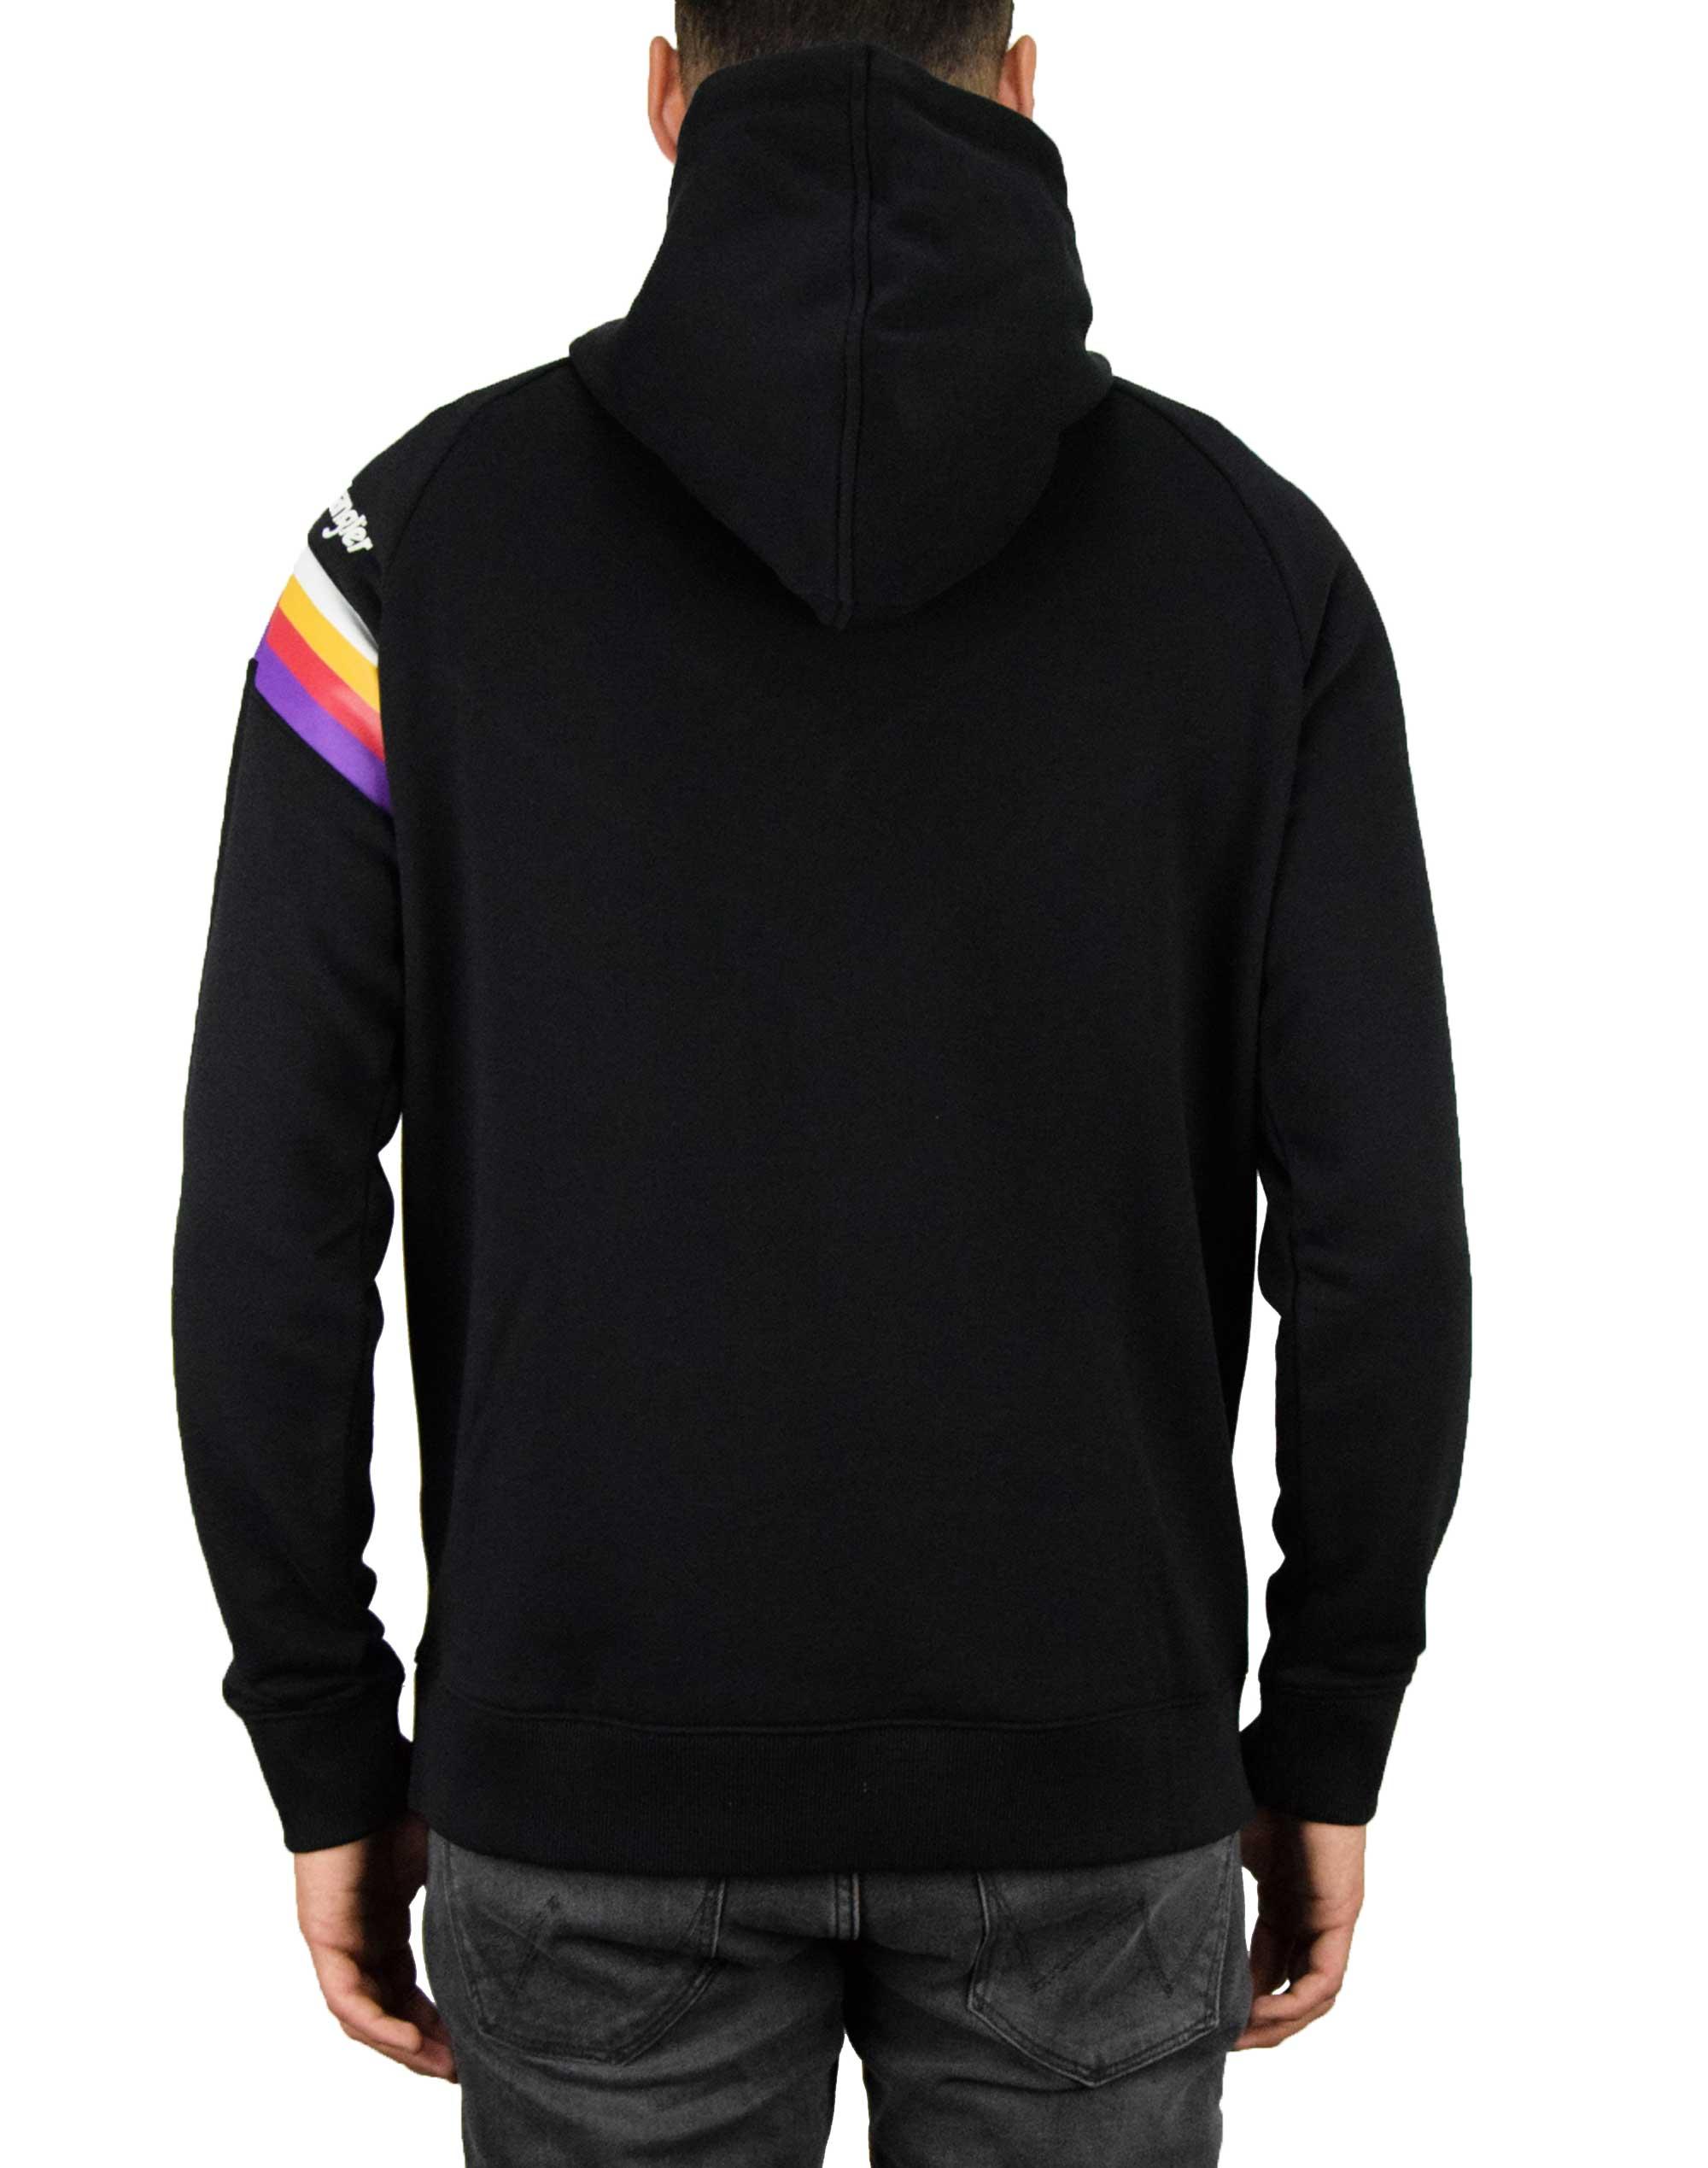 Wrangler Cut & Sew Hoodie (W6A7IK100) Black